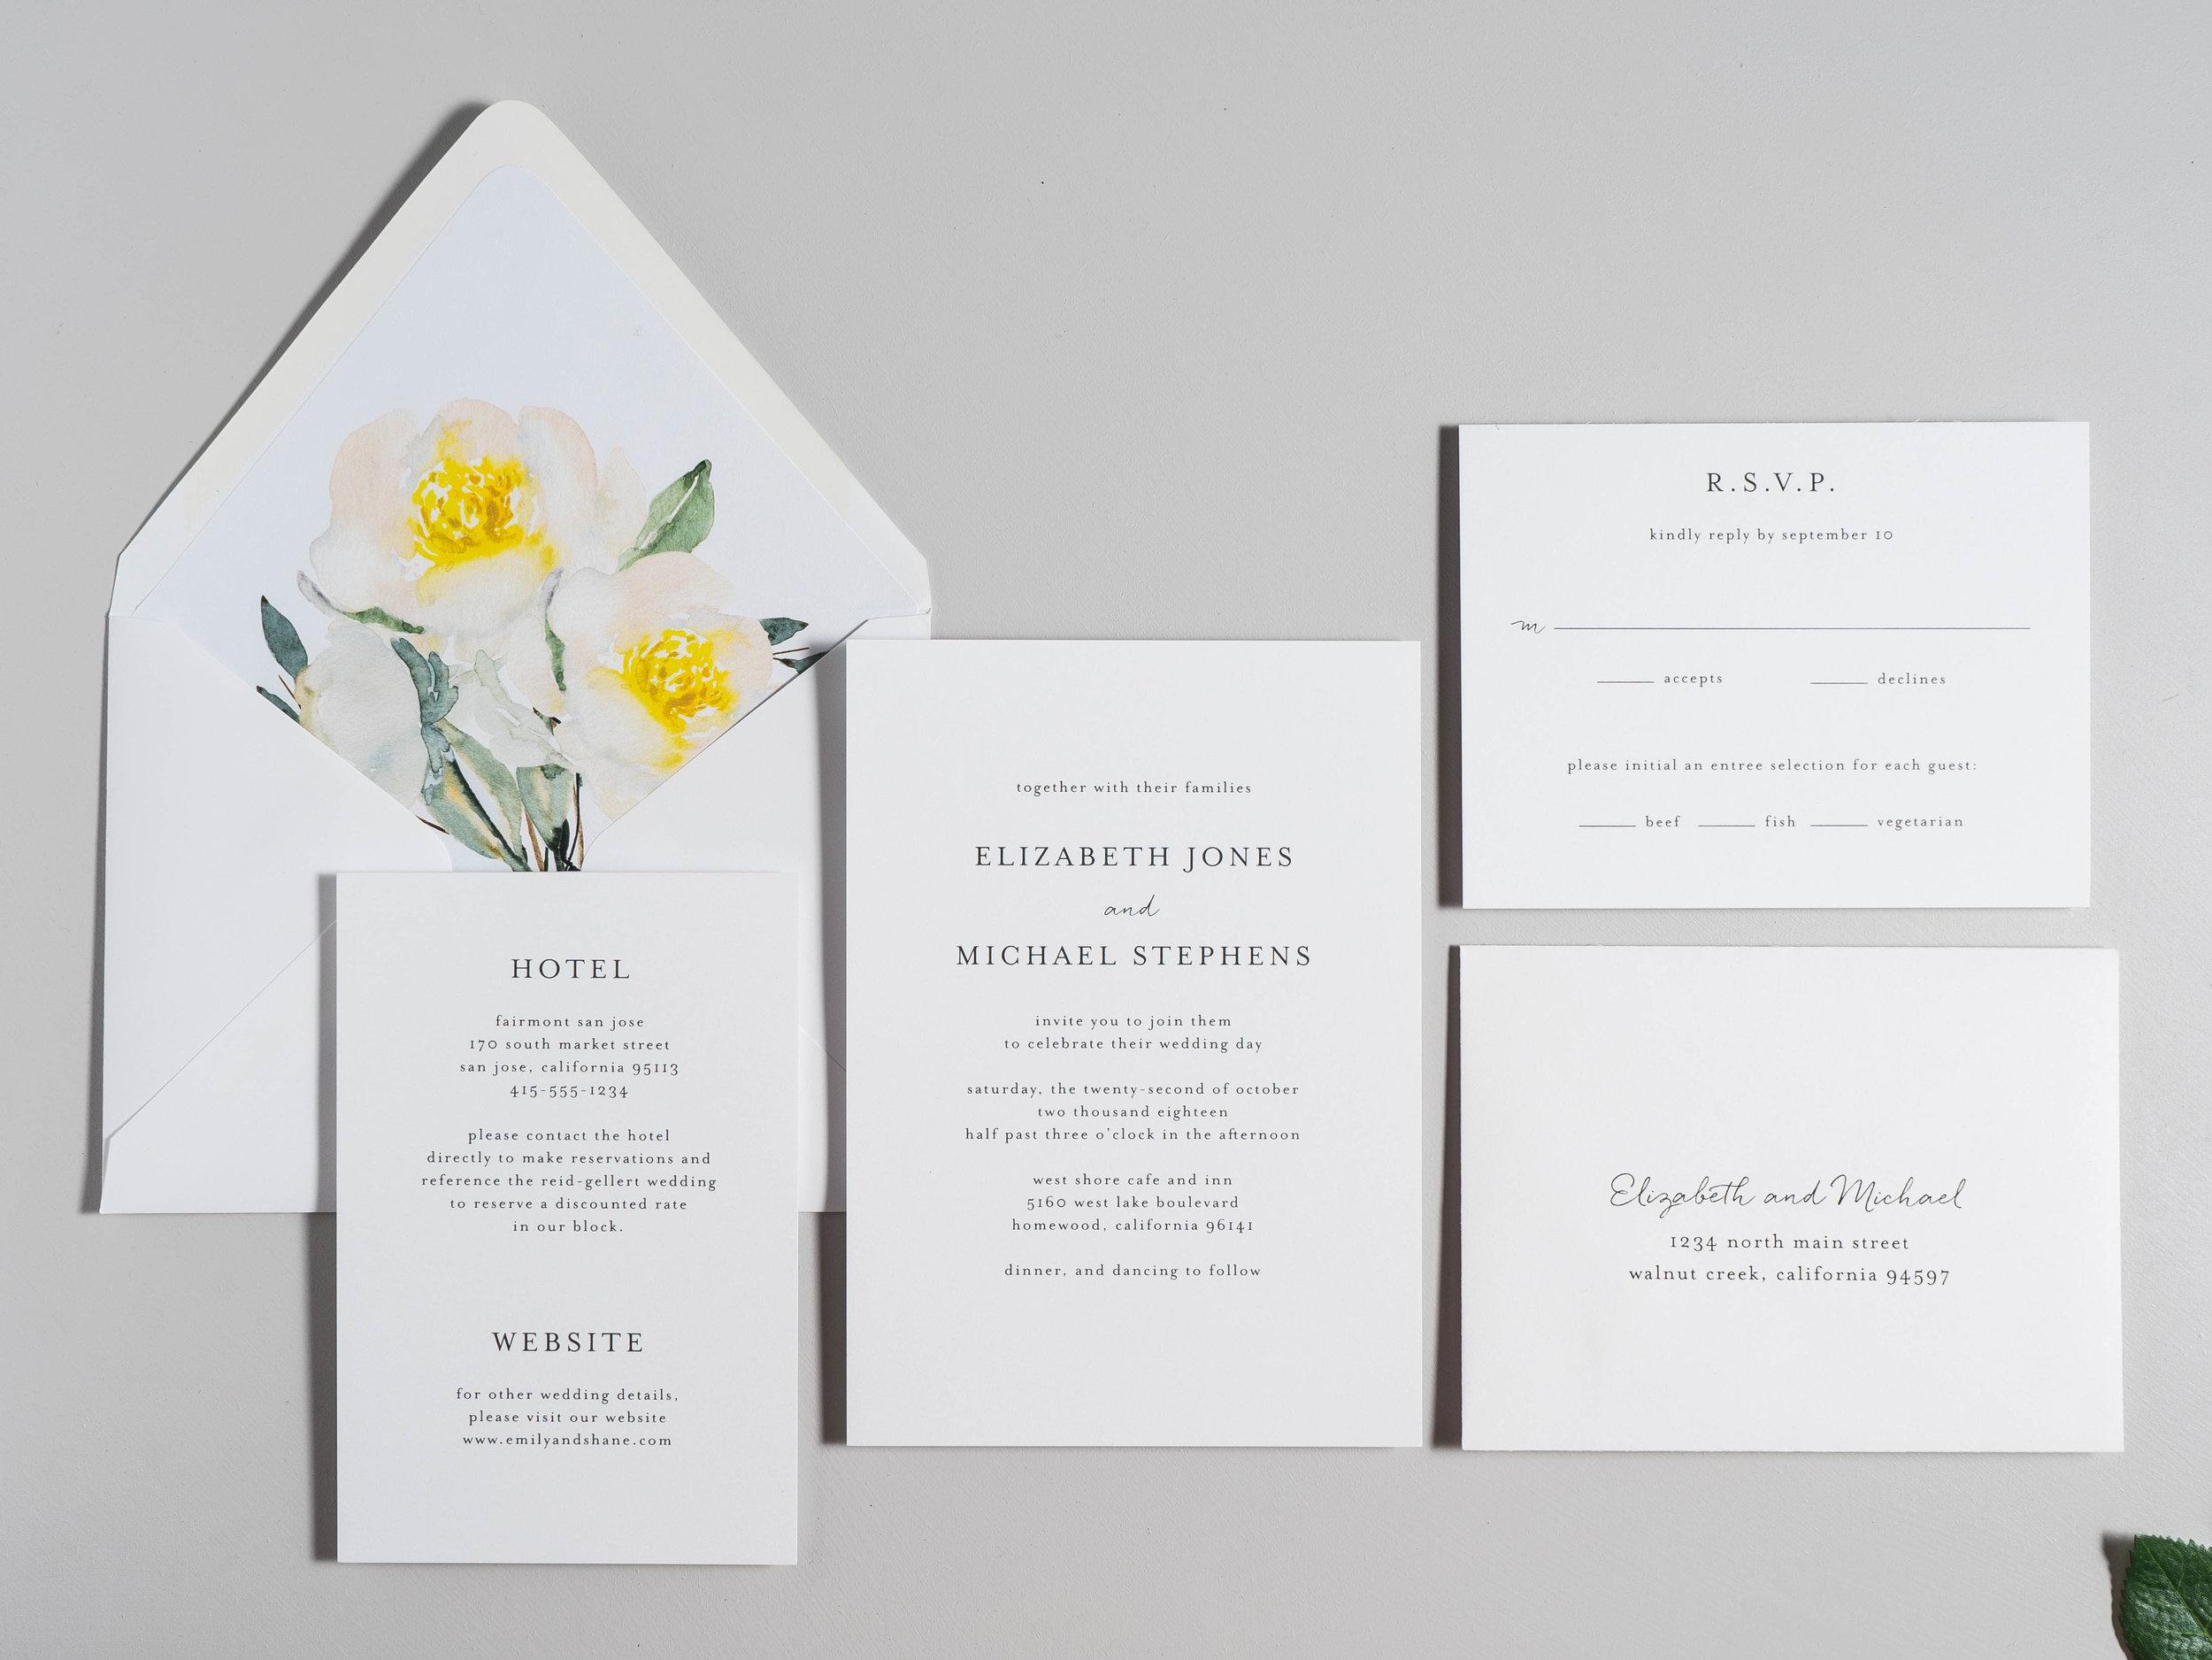 Botanical Minimalist V2 Wedding Invitations by Just Jurf-1b.jpg